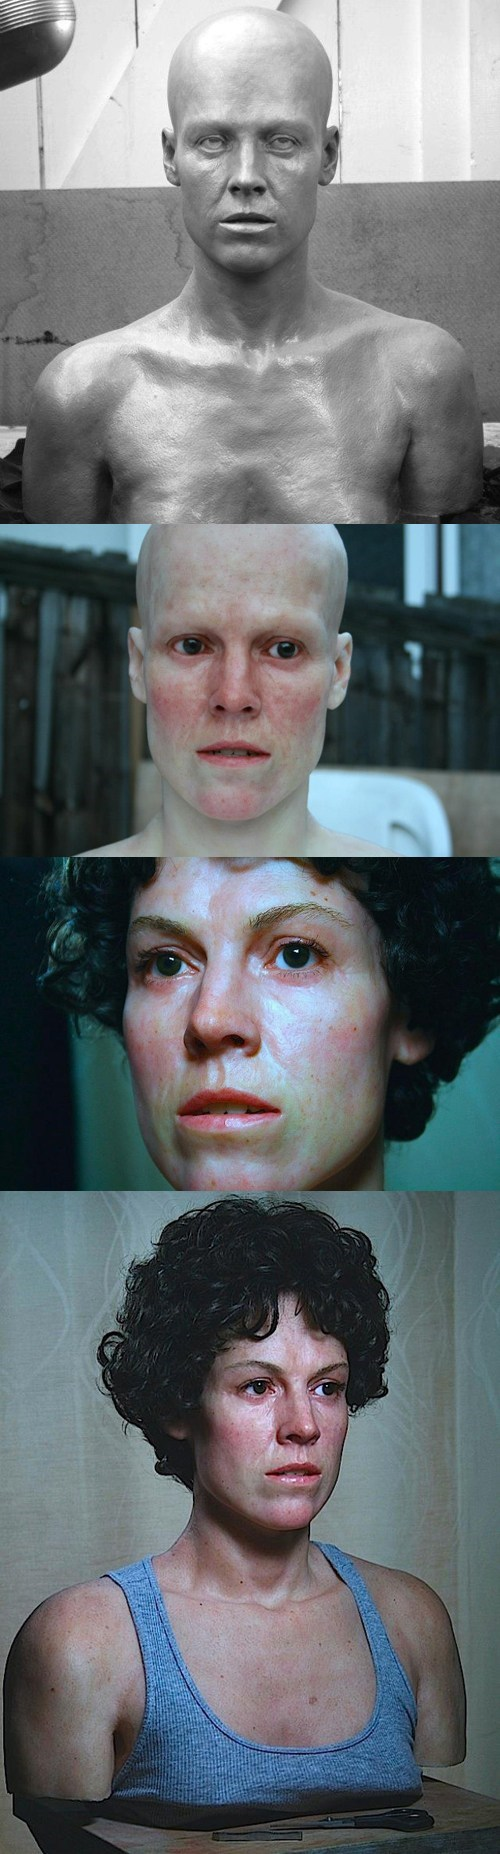 Creepy Realistic Ripley Statue